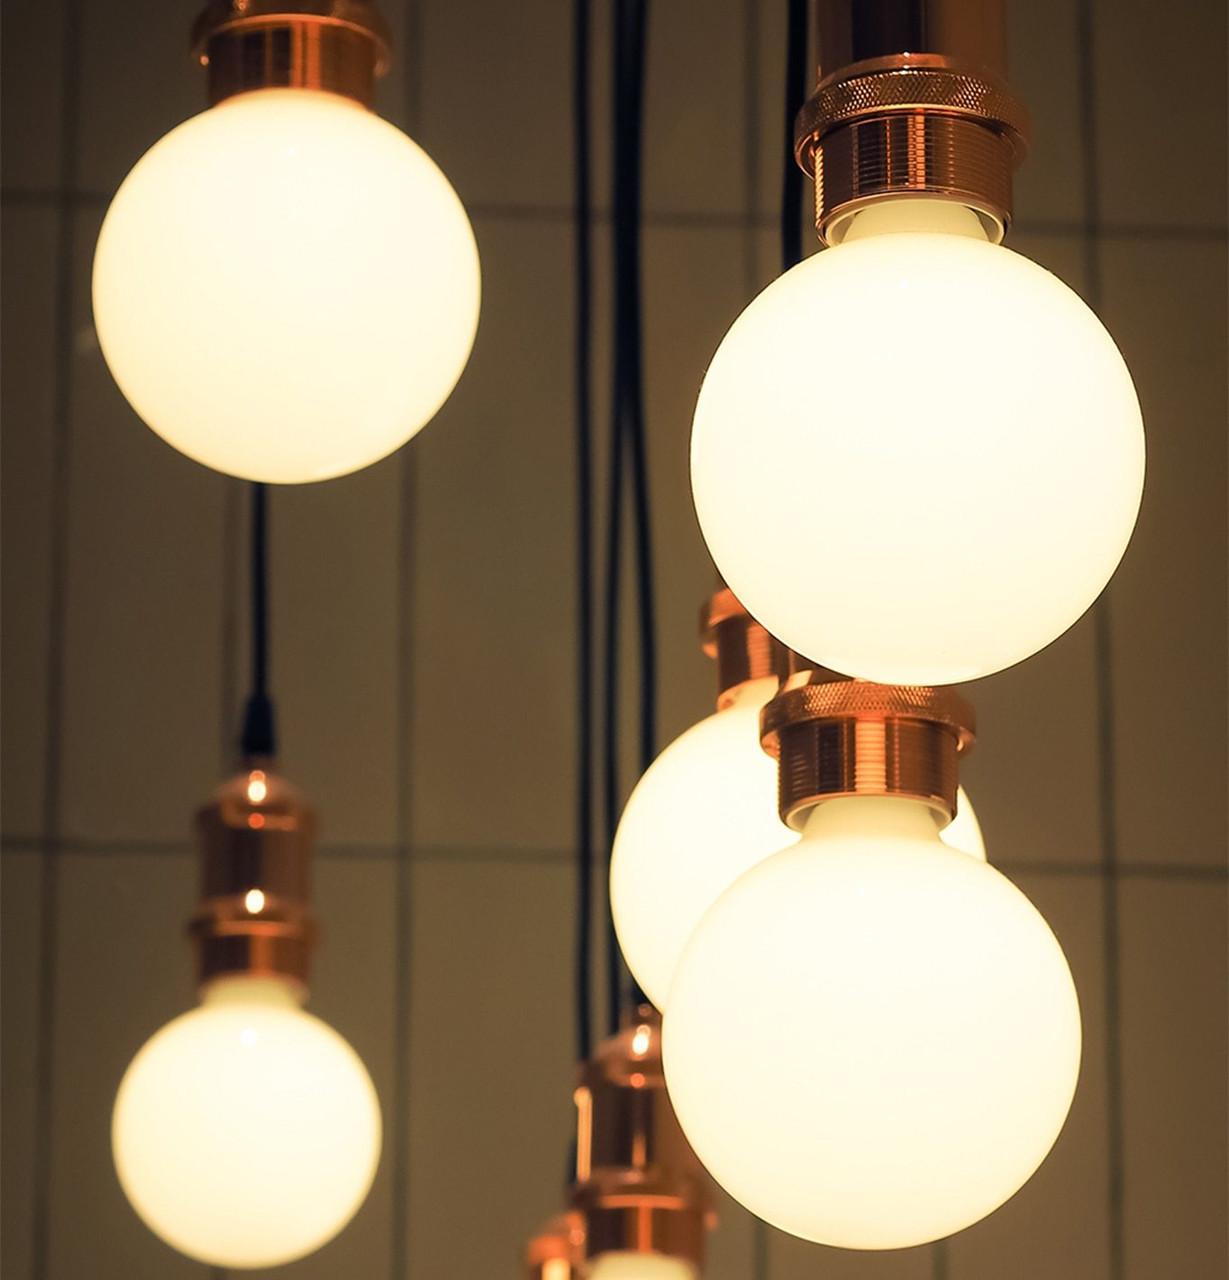 LED Dimmable Globe Opal Light Bulbs